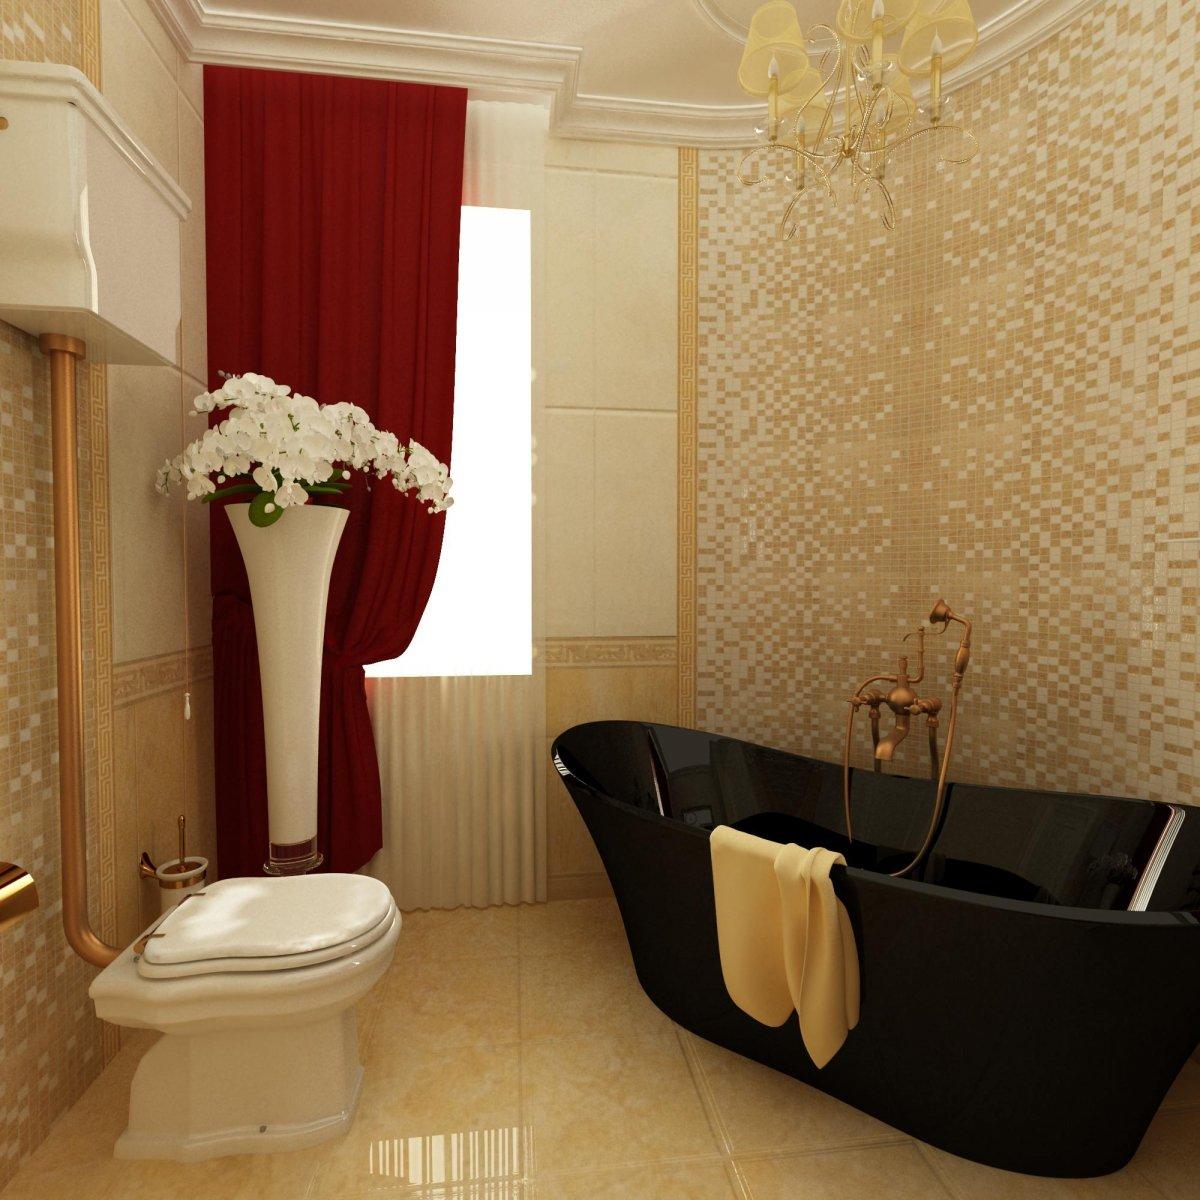 Design interior si amenajare interioara pentru o casa - Chic-8